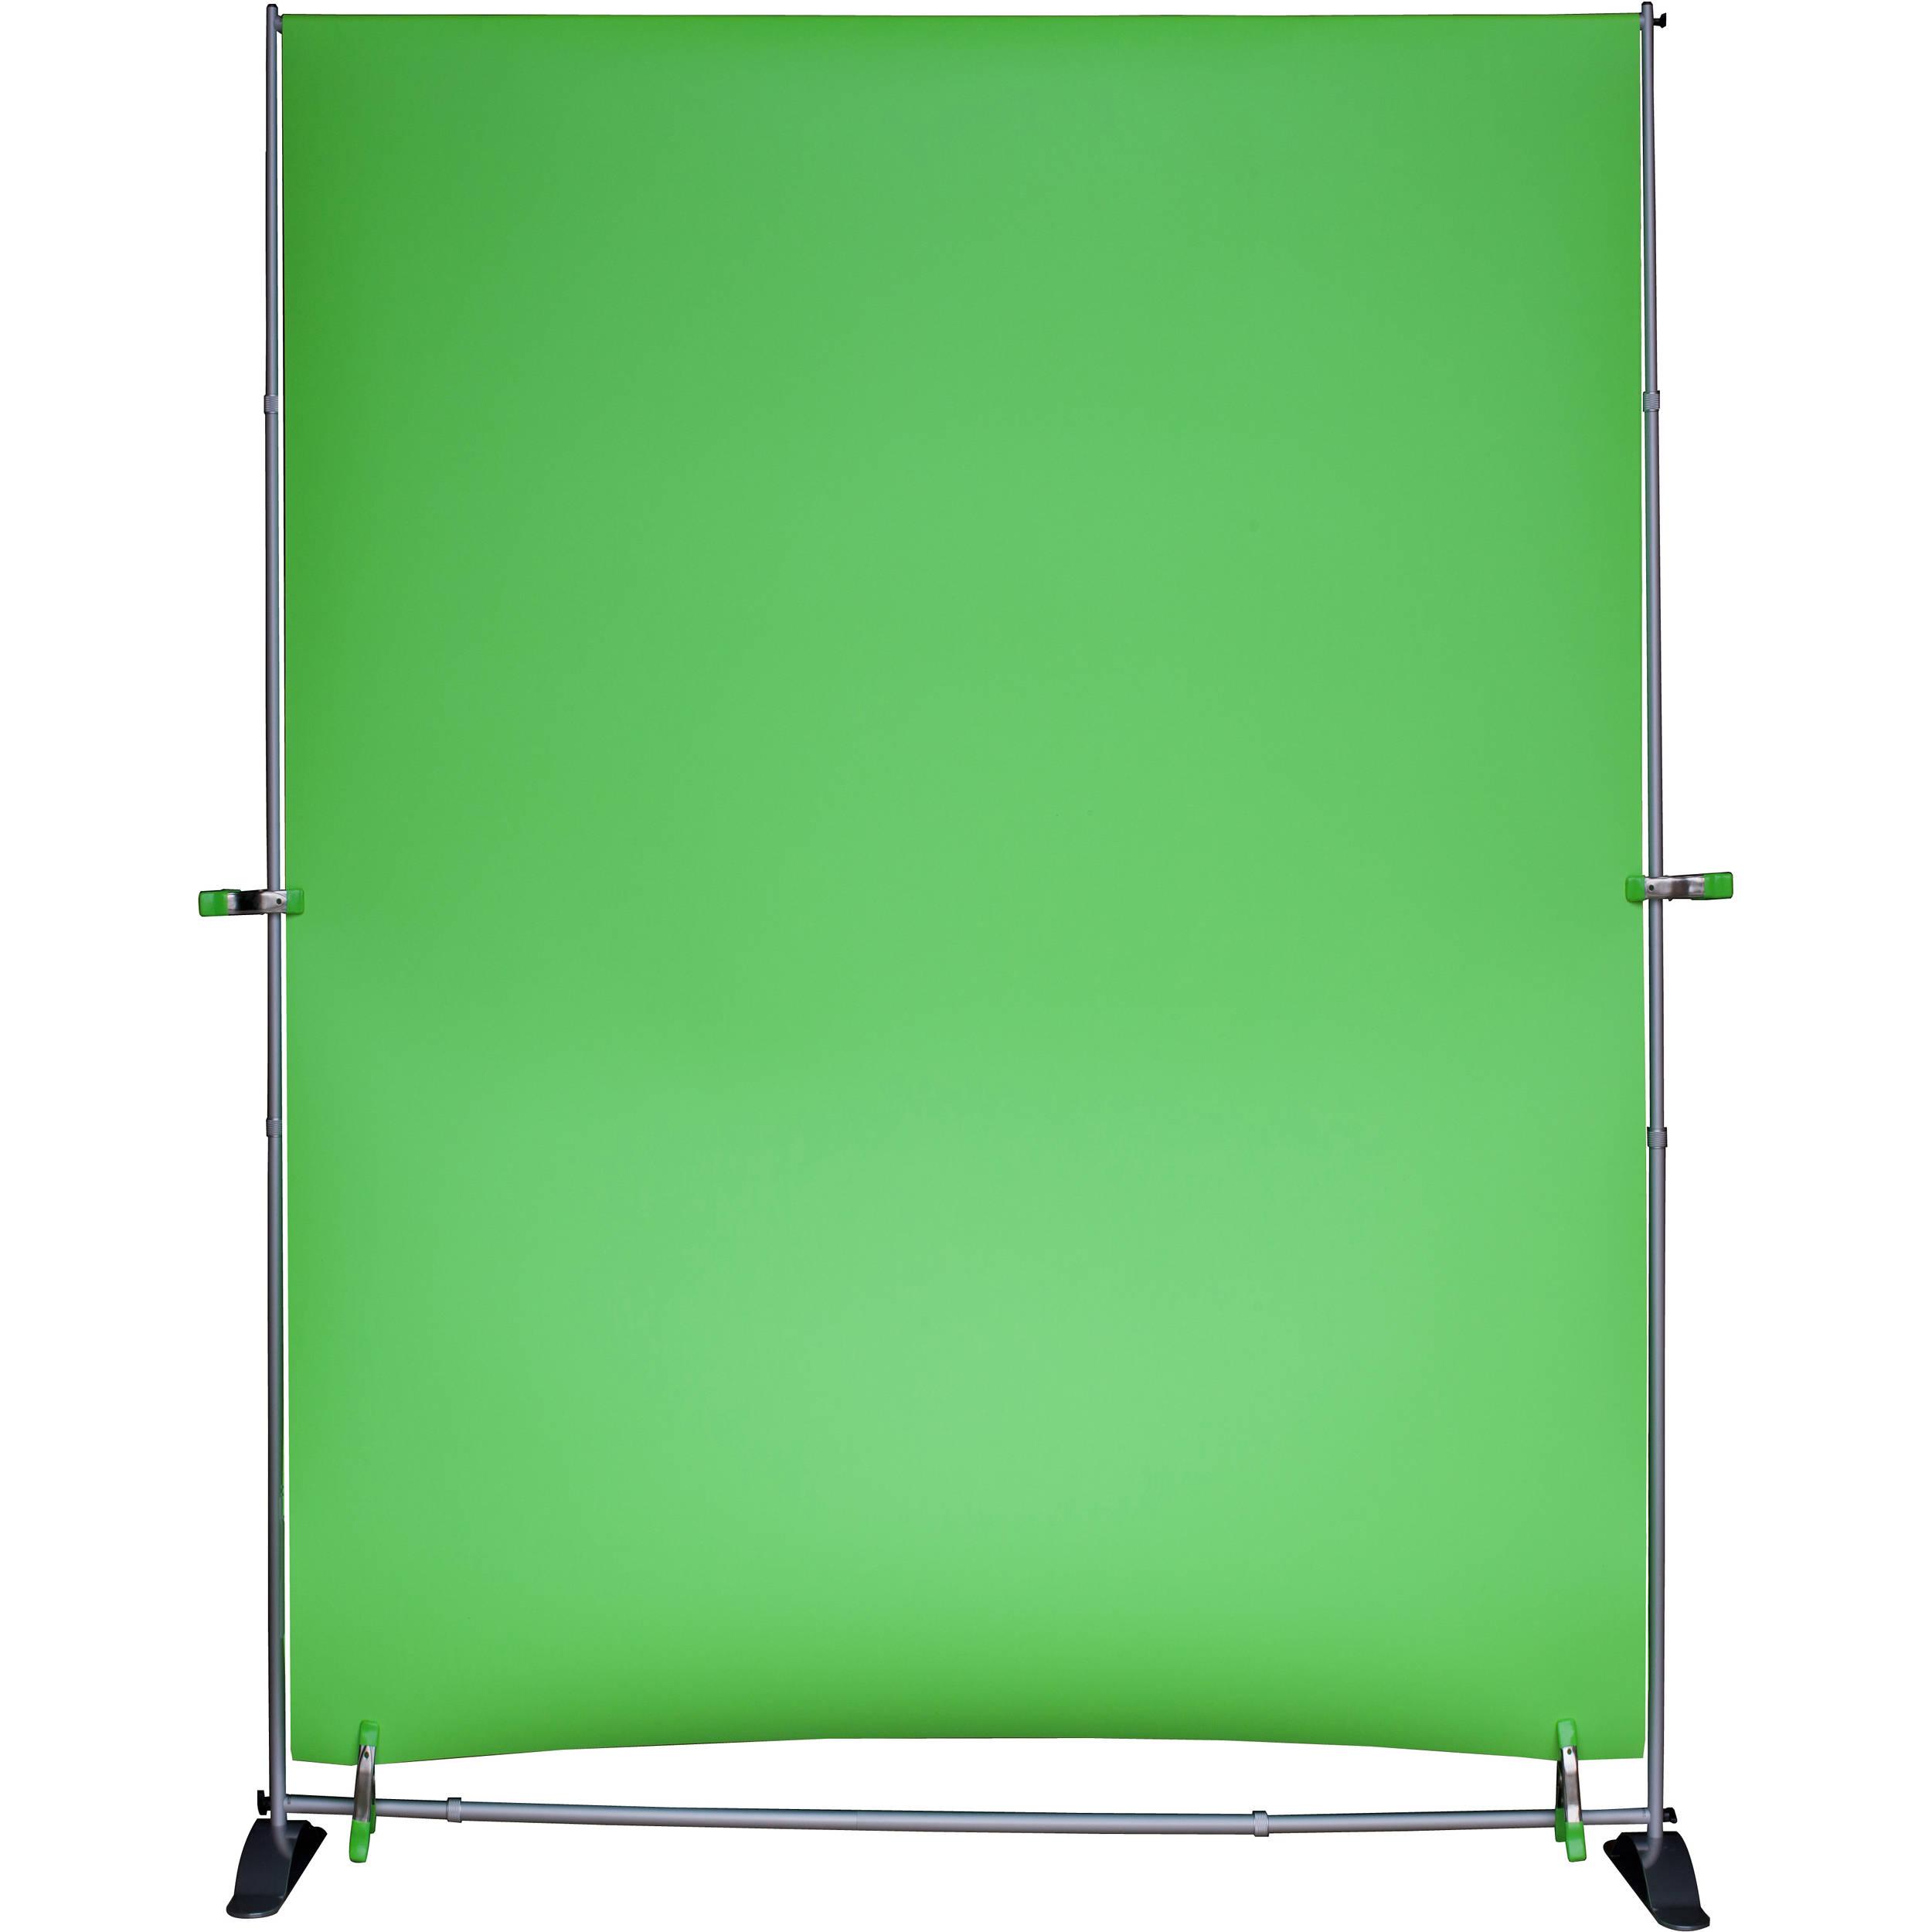 Pro Cyc GS60 Portable Green Screen Background (60x80